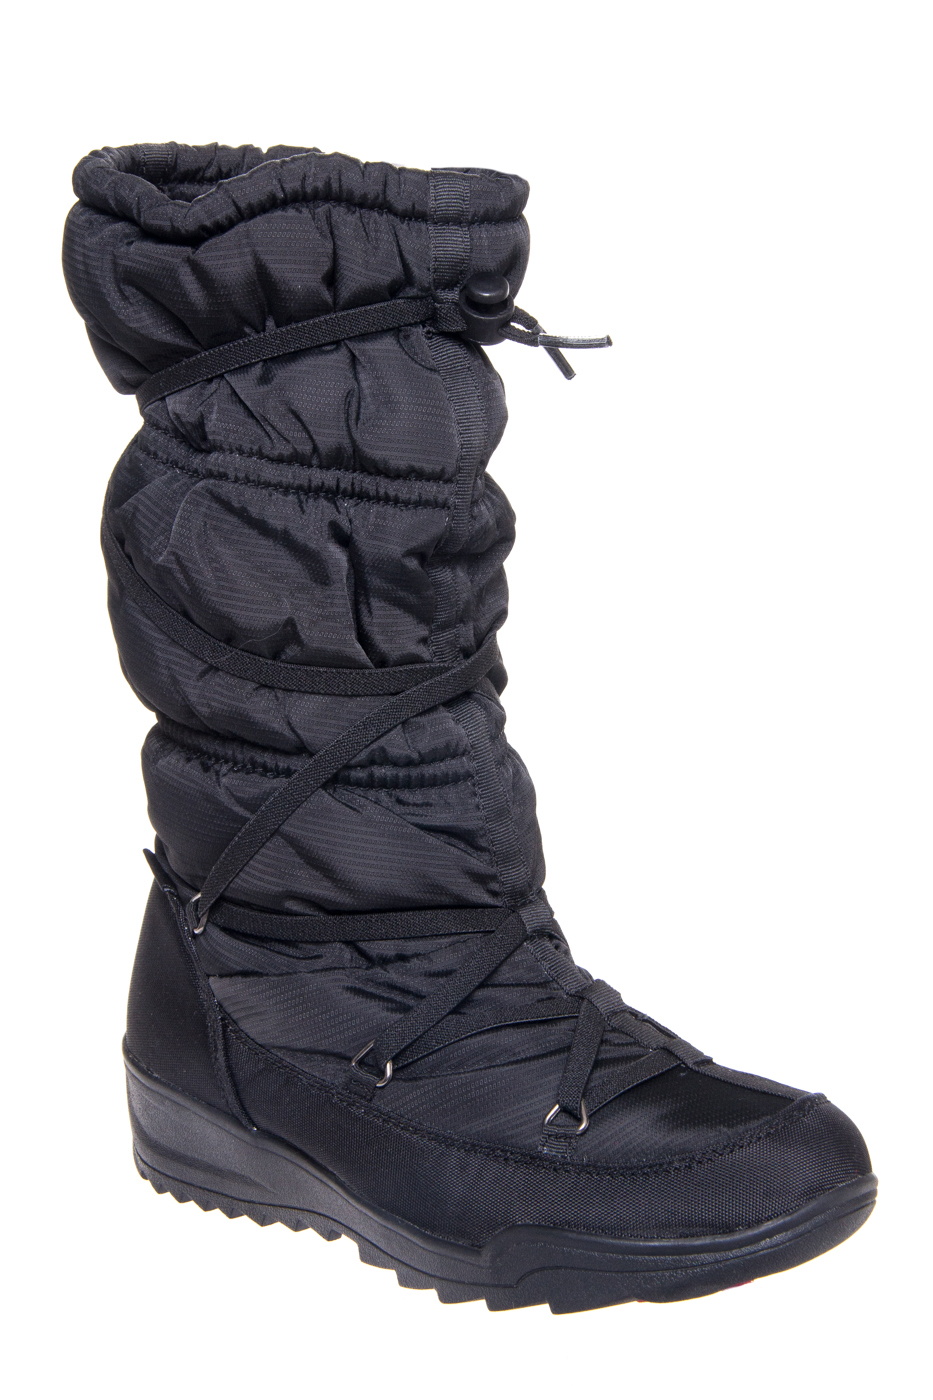 Kamik Luxembourg Mid-Calf Waterproof Boots - Black